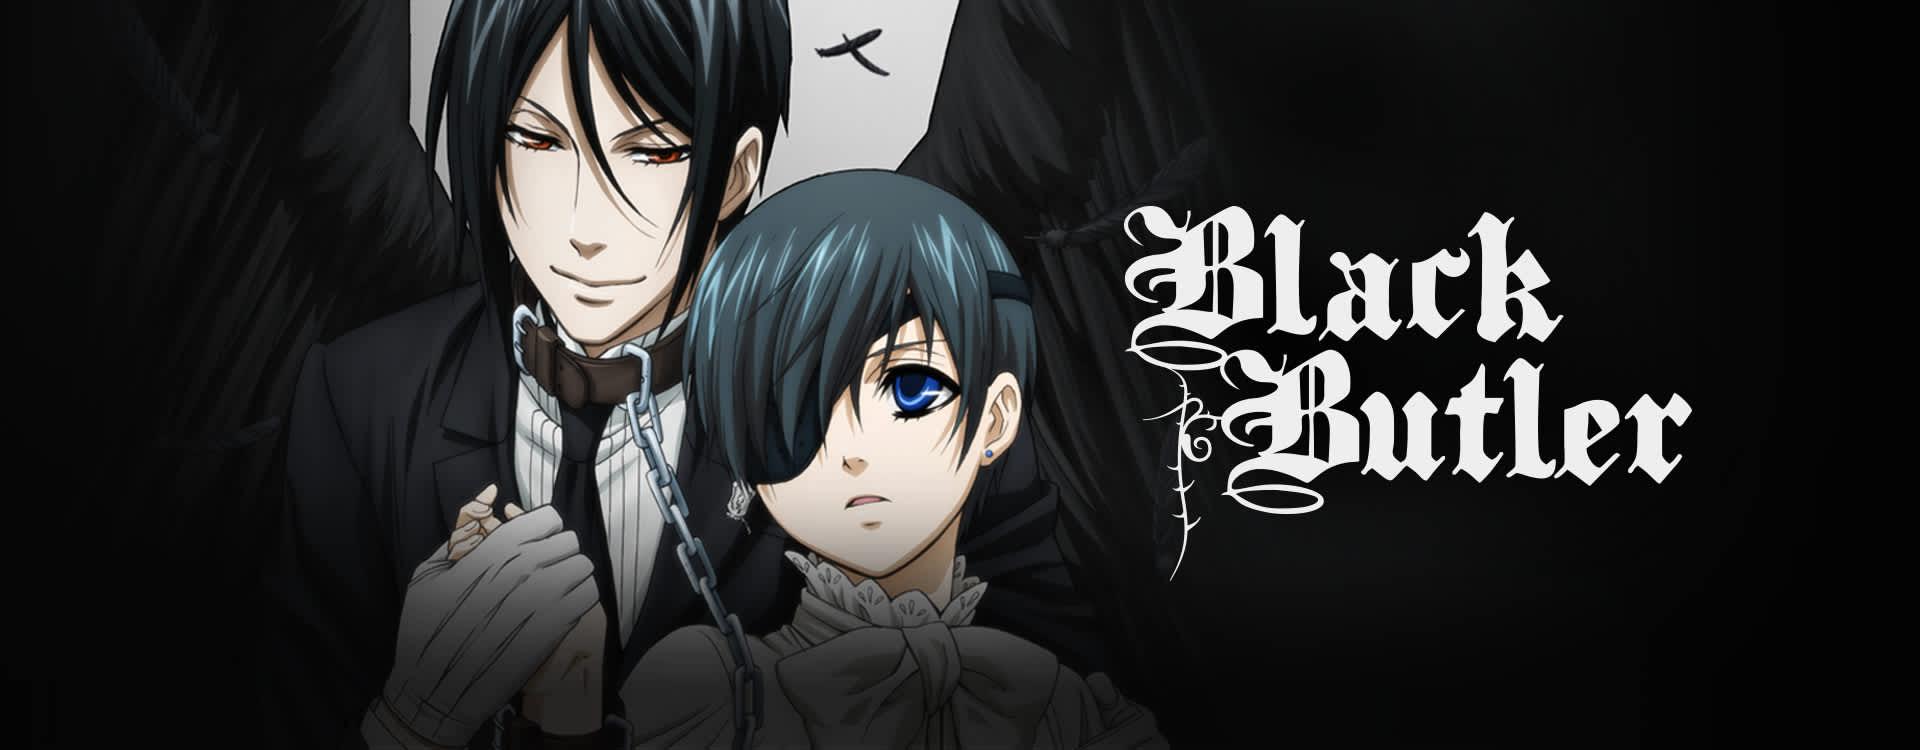 Watch Black Butler Episodes Sub & Dub | Drama, Psychological